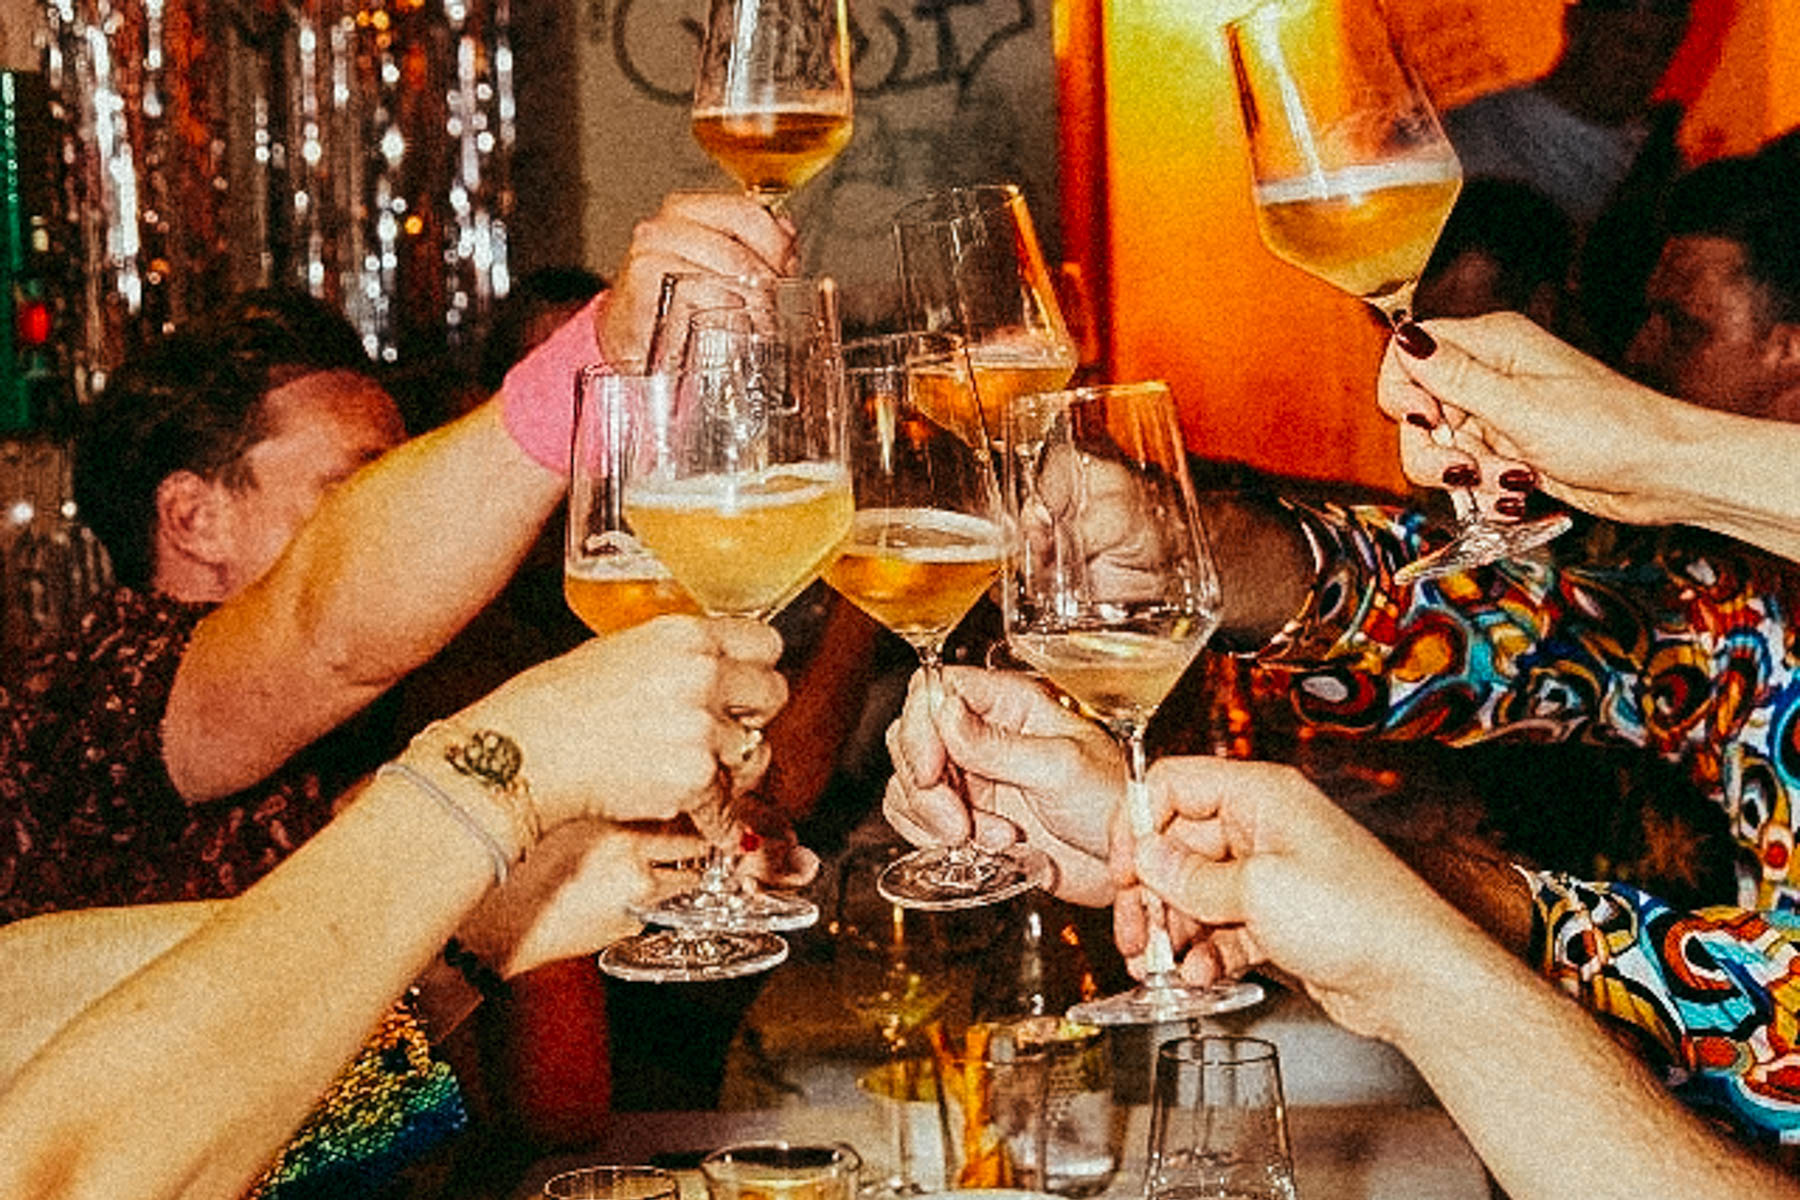 Location Mf Party – ©Munich Wine Rebels